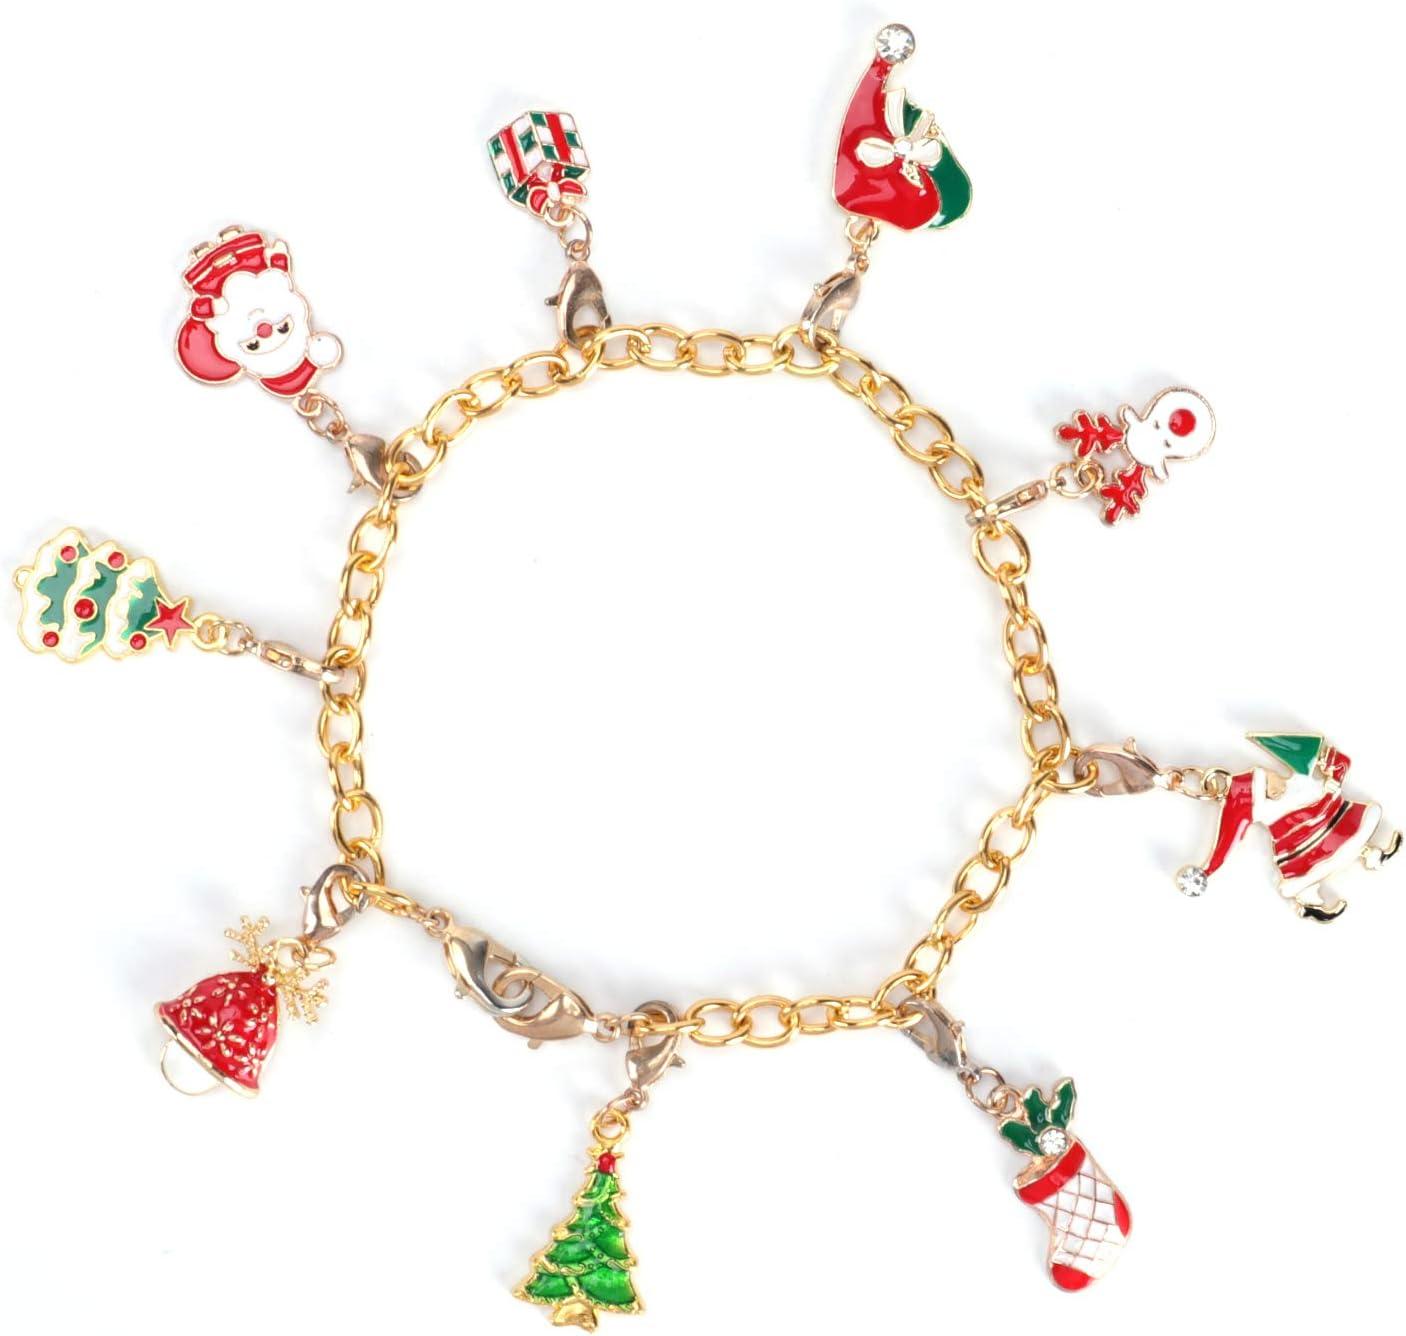 Mtele 2020 Christmas Advent Calendar 24 pcs Tree Hanging Decor DIY Xmas Ornaments with Bracelet Necklace Set Fashion Jewelry for Kids